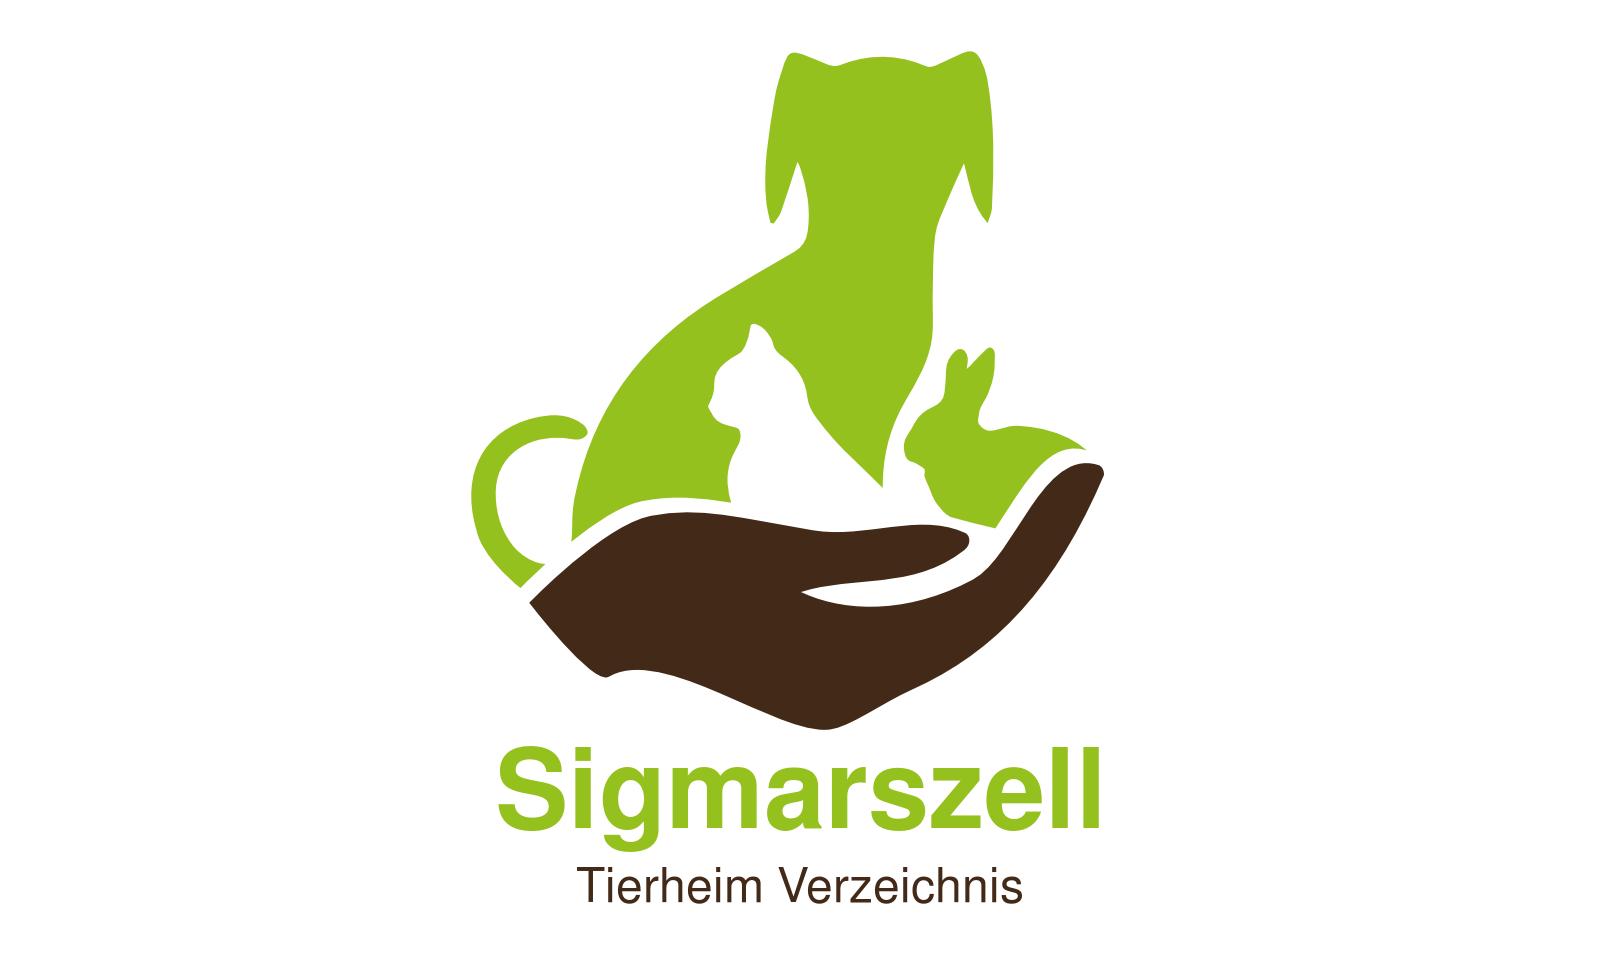 Tierheim Sigmarszell